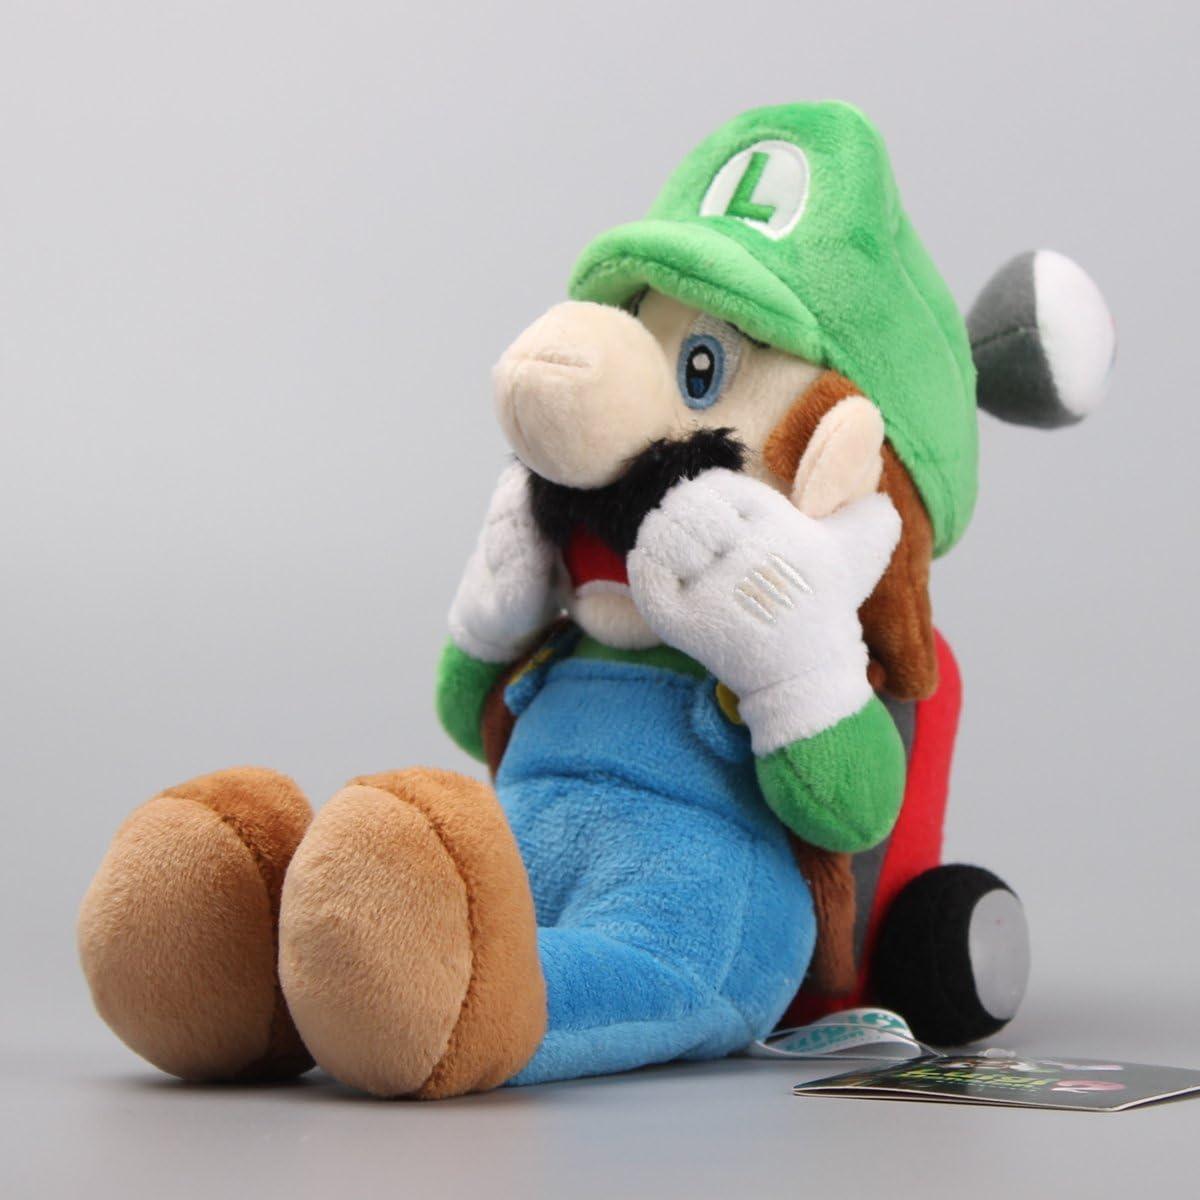 uiuoutoy Super Mario Luigis Mansion Scared Luigi with Strobulb Plush 10